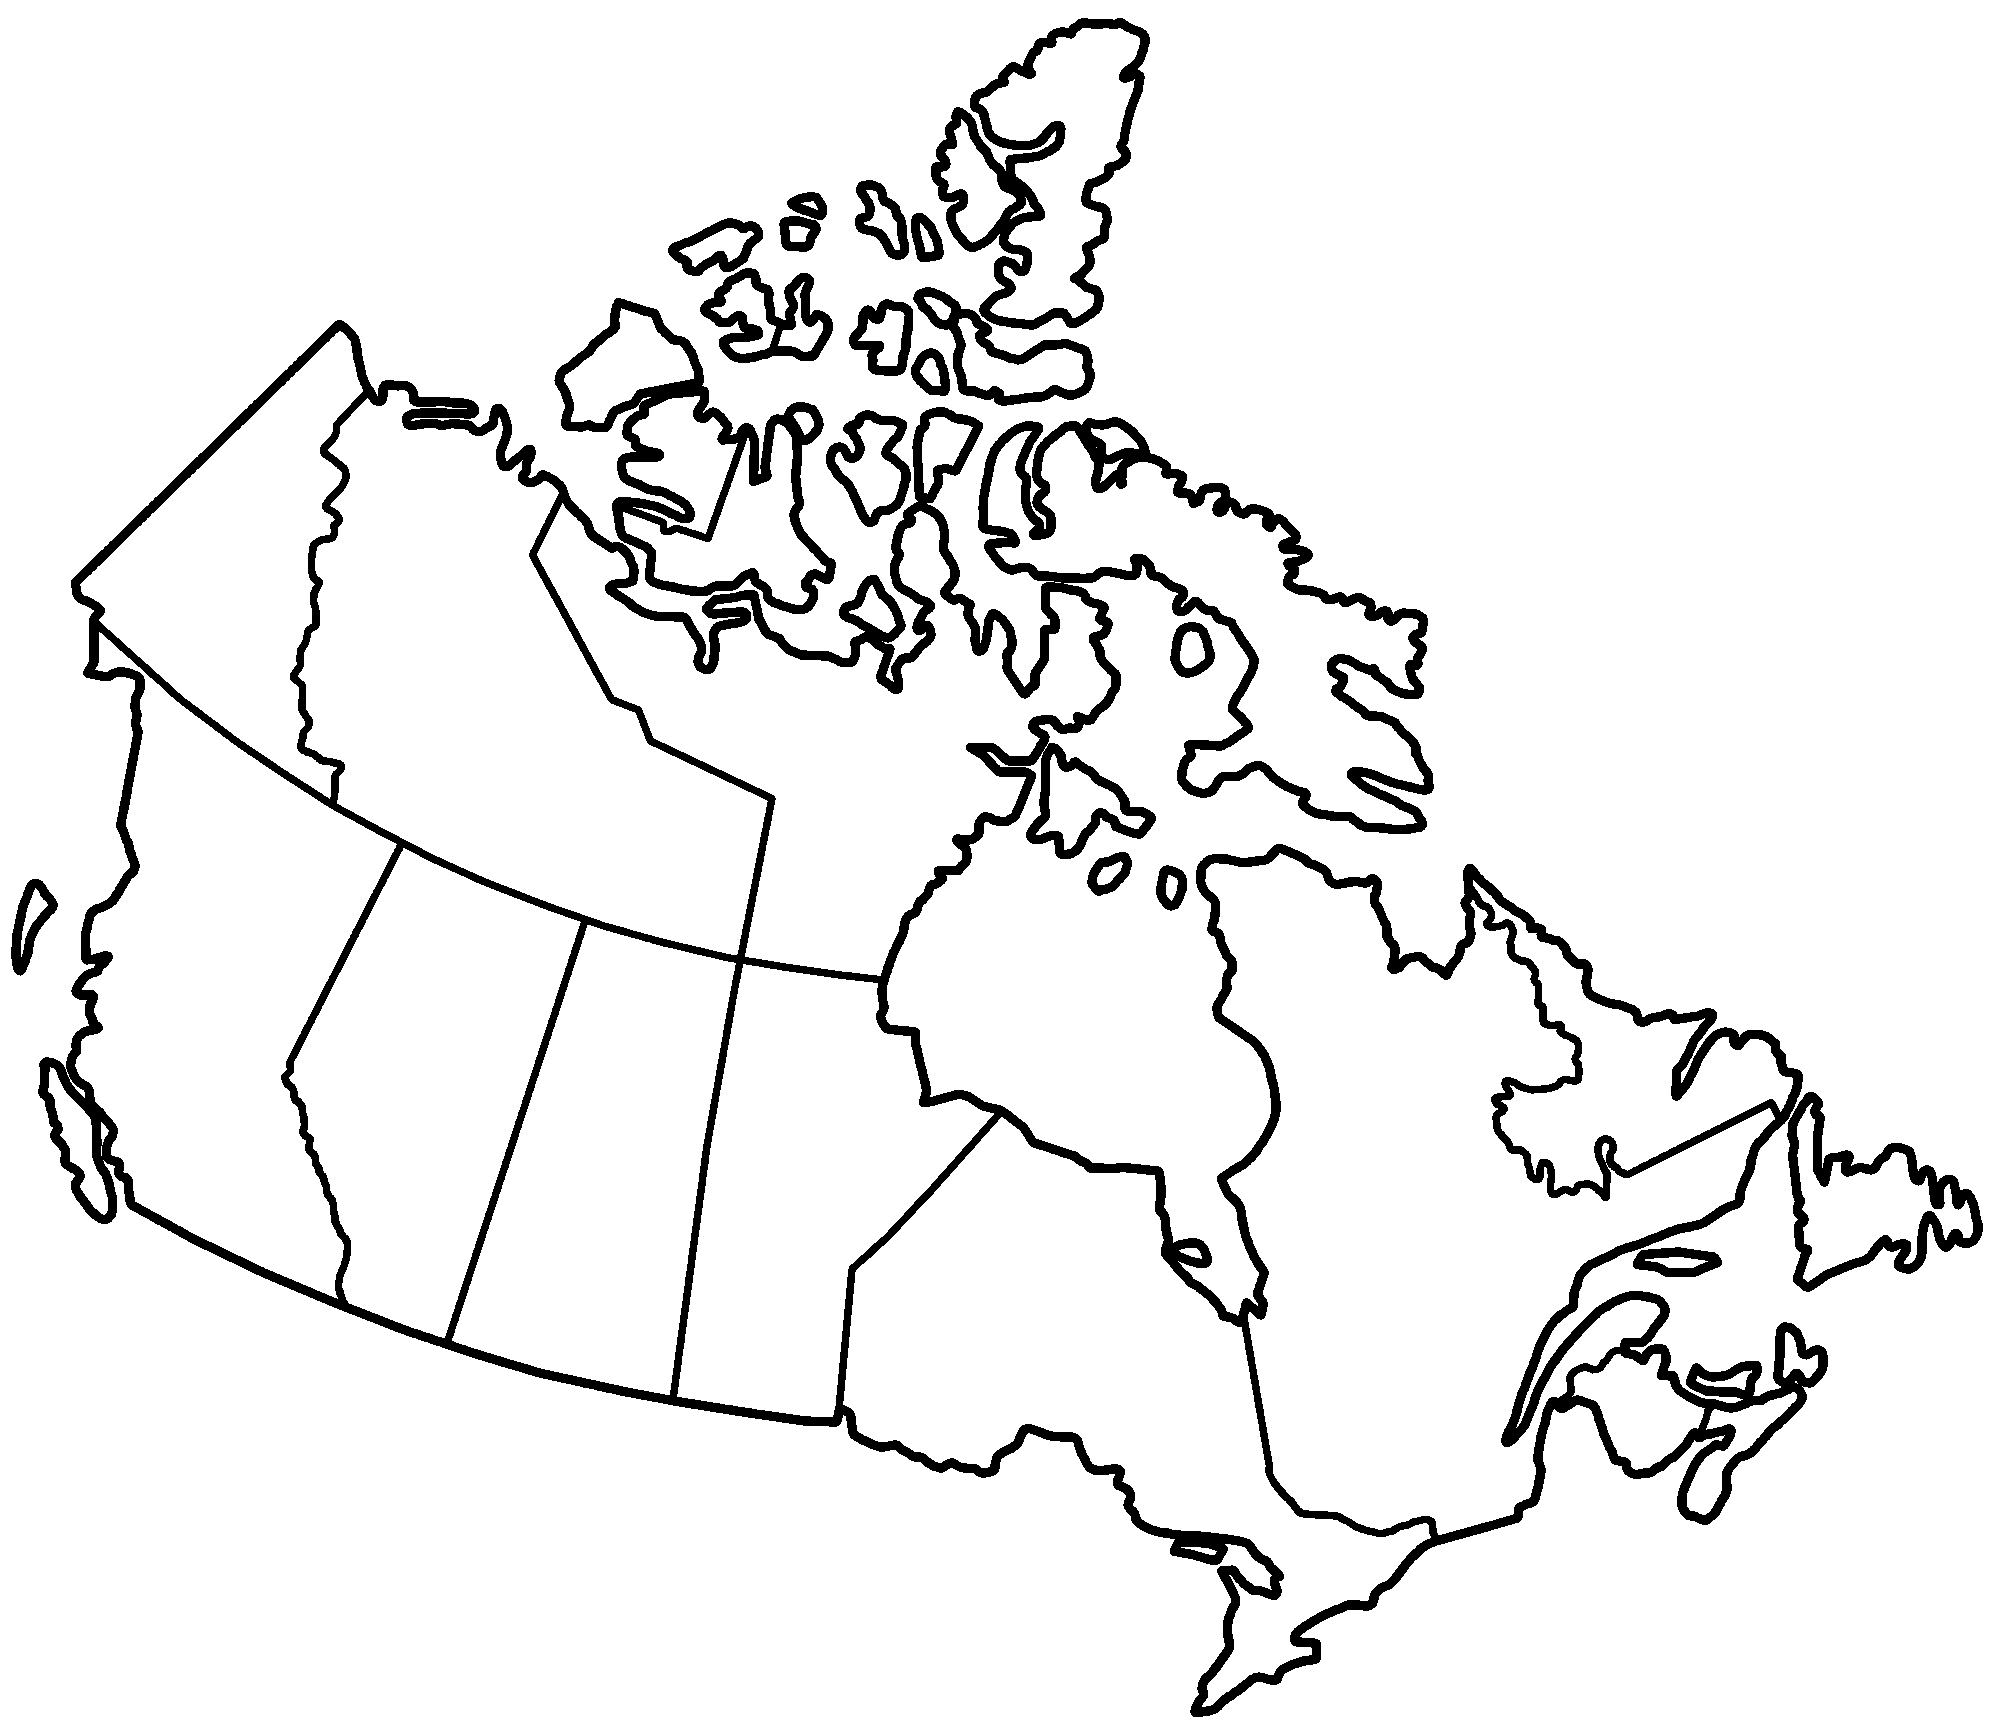 canada map blank printable 25 Elegant Blank Map Of Canada To Label canada map blank printable